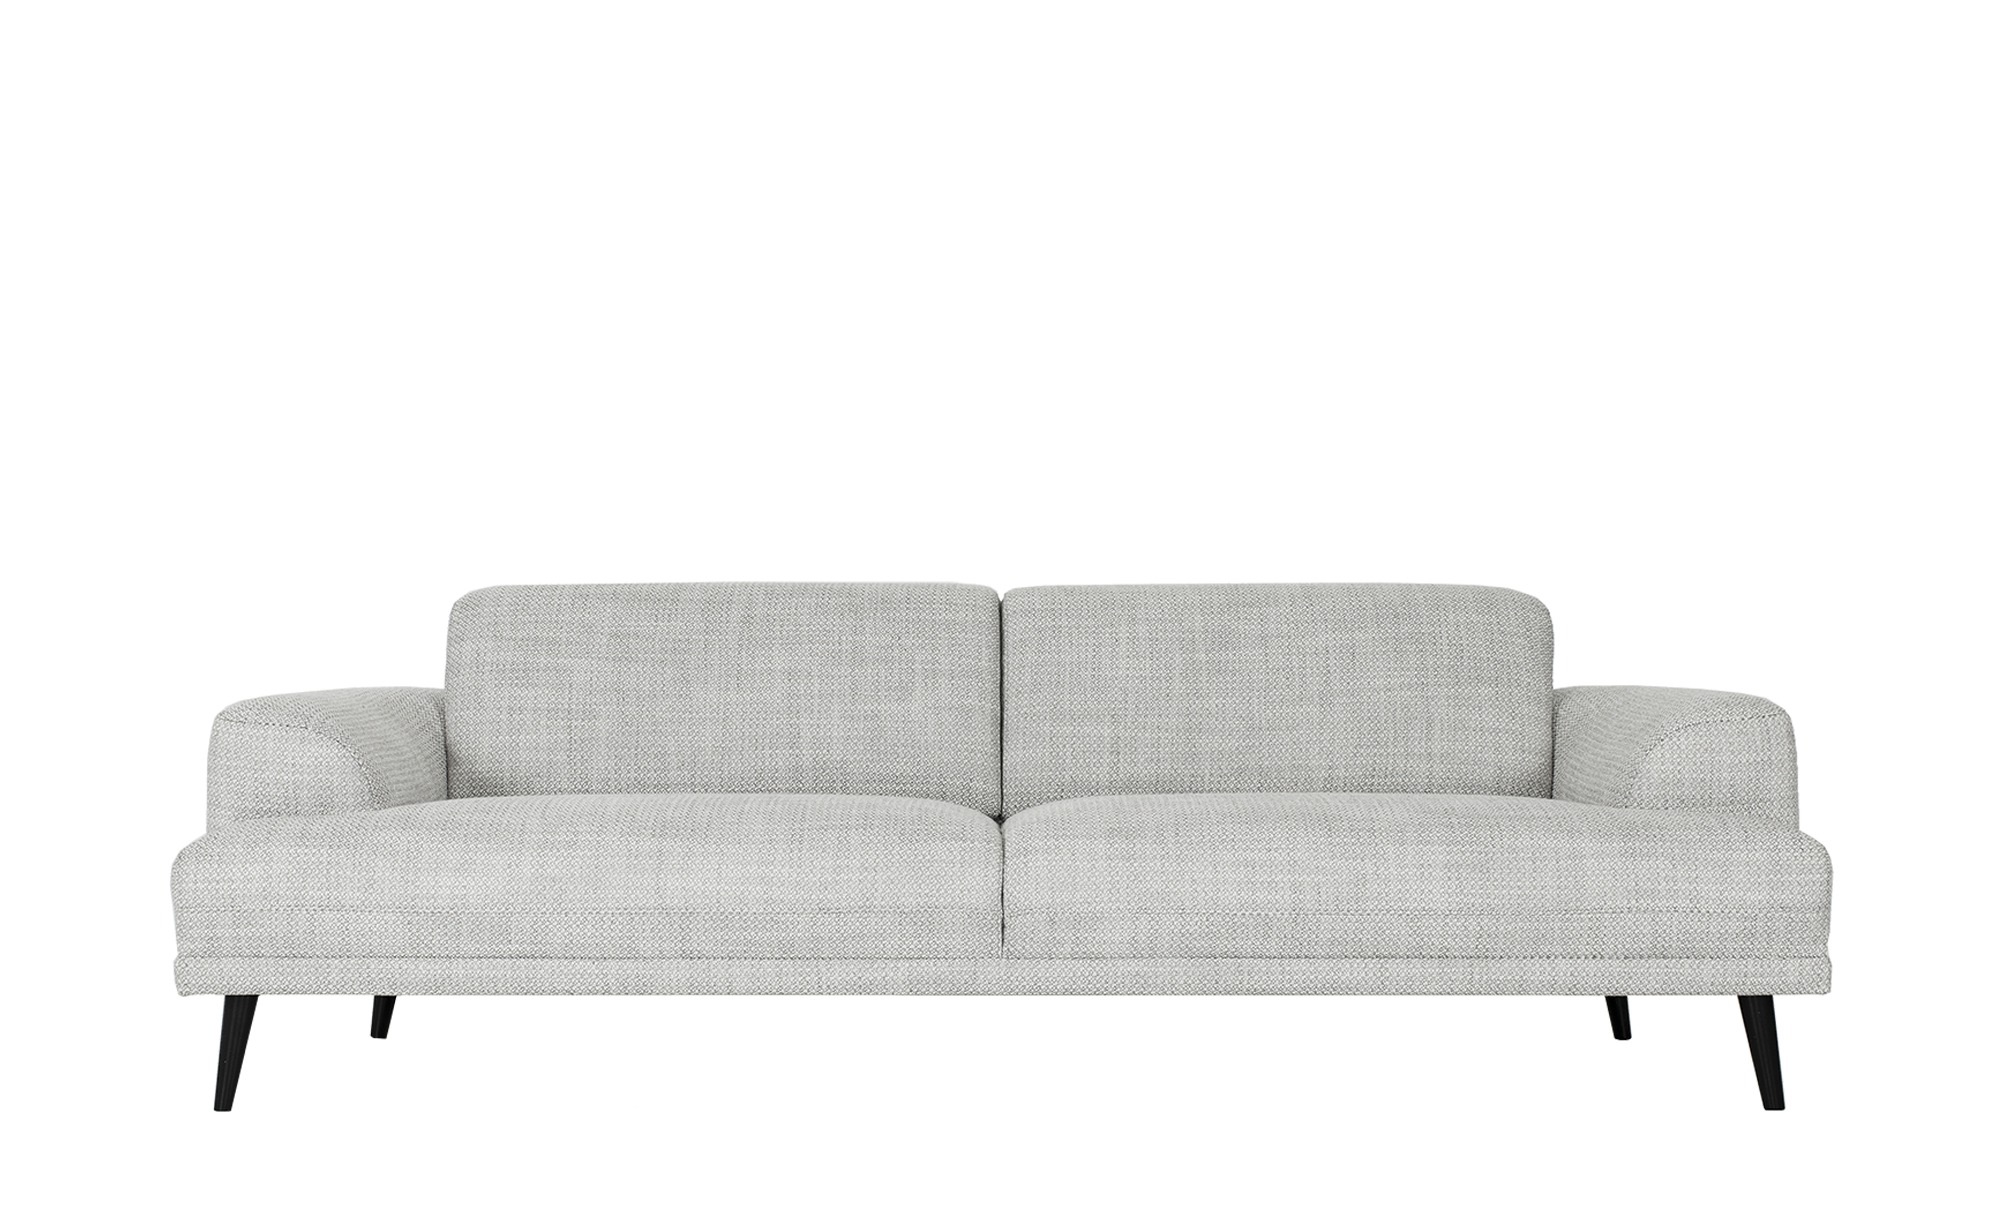 Sofa  Nevi ¦ grau ¦ Maße (cm): B: 234 H: 78,5 T: 93 Polstermöbel > Sofas > 3-Sitzer - Höffner